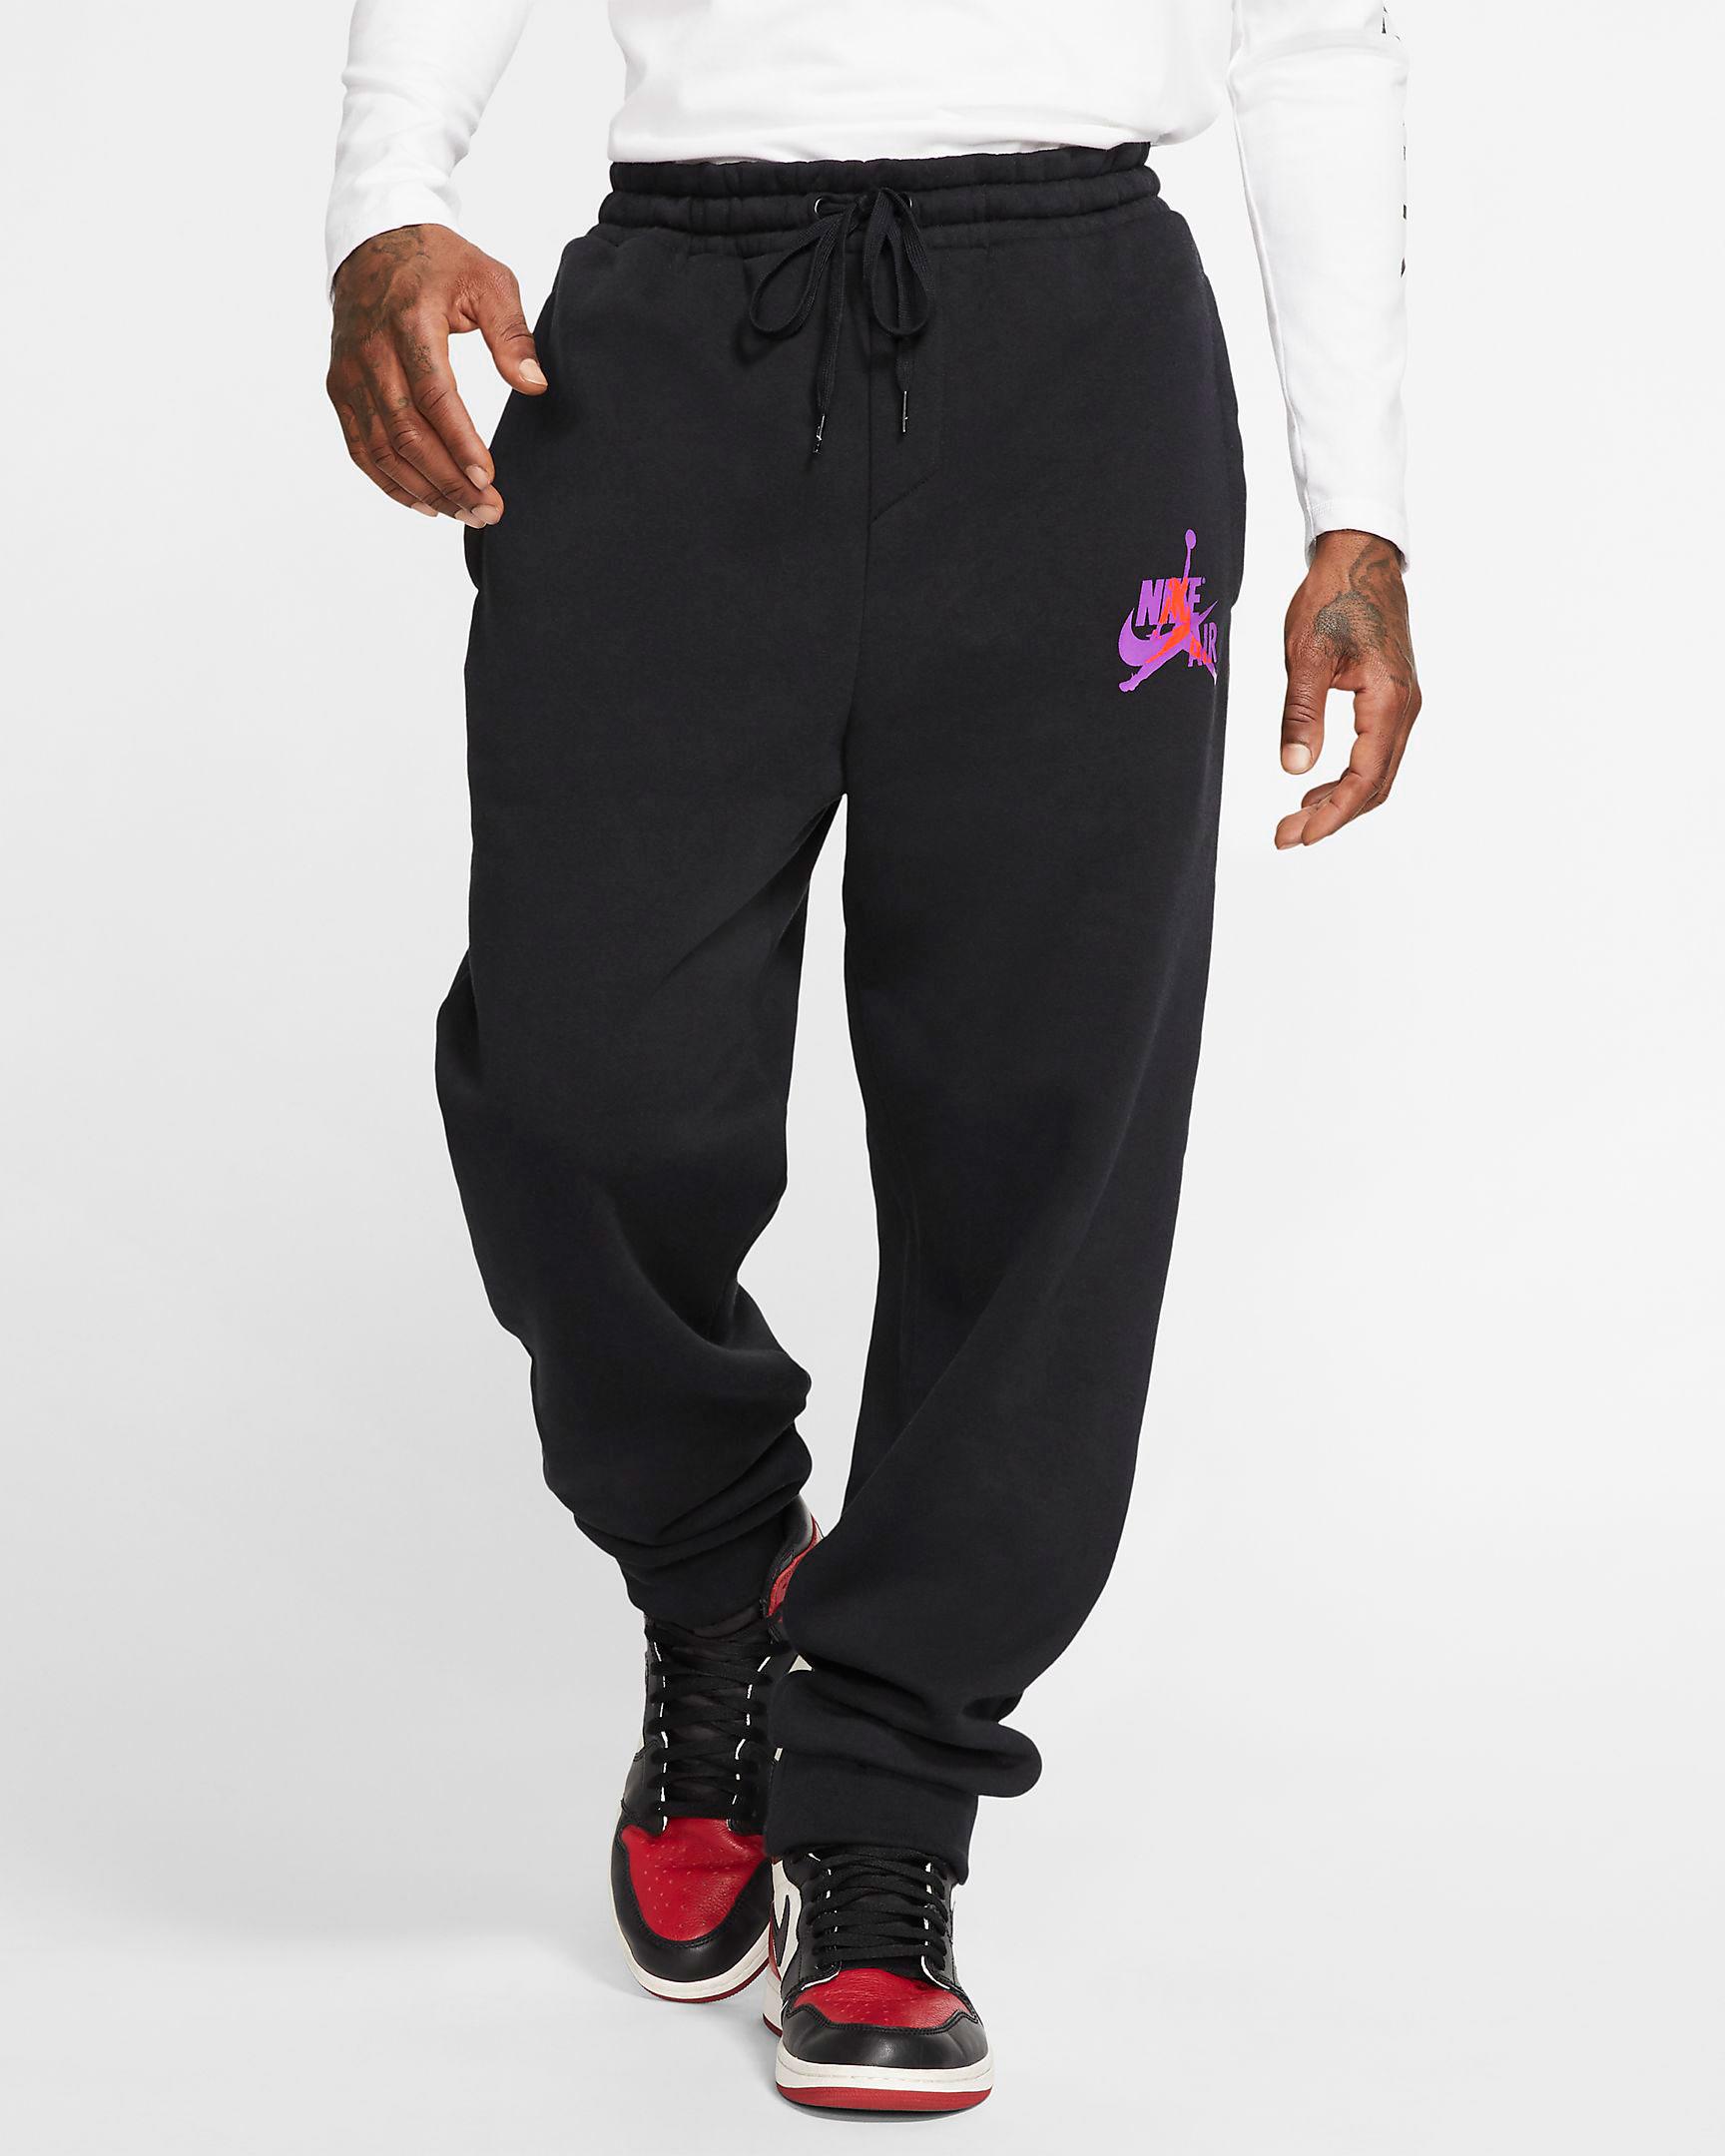 jordan-jumpman-classics-pants-black-infrared-purple-1